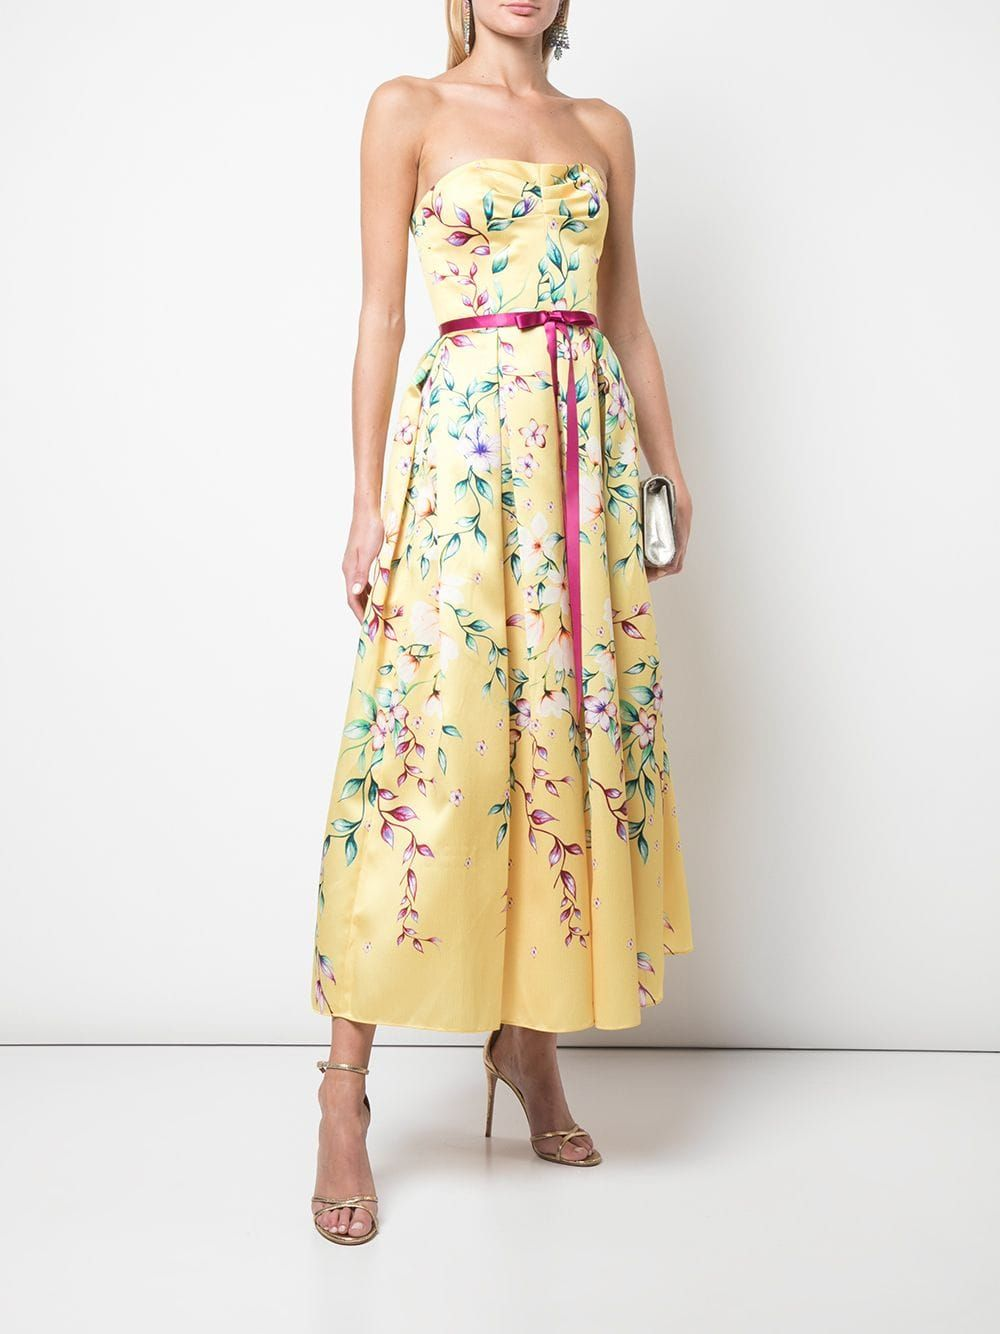 Marchesa Notte Mikado Tea Midi Dress Farfetch Dresses Midi Dress Tea Length Dresses [ 1334 x 1000 Pixel ]